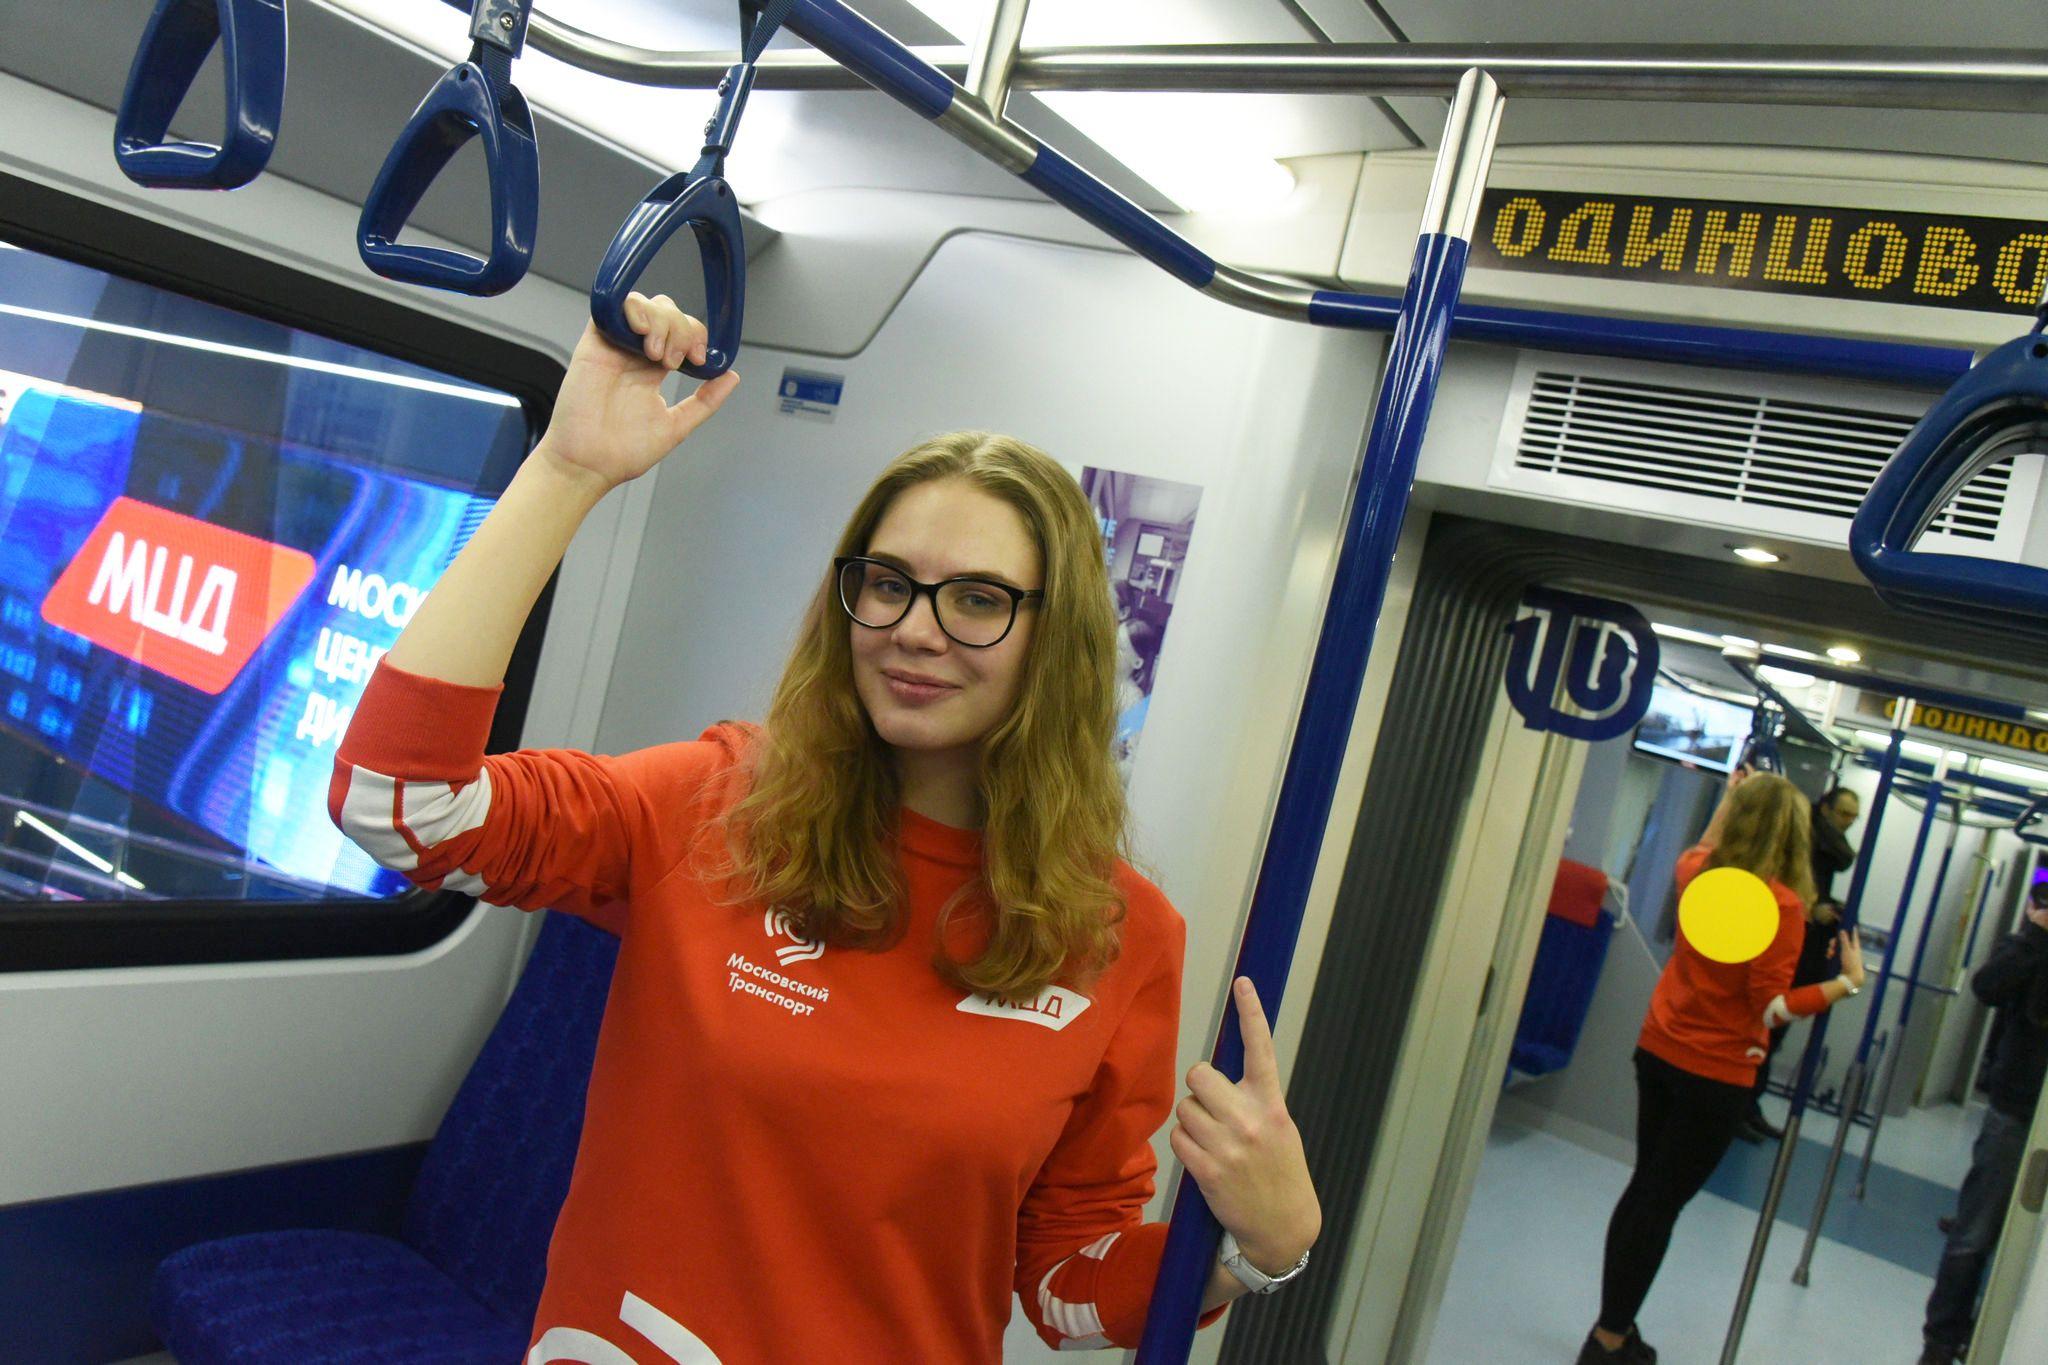 Московские власти запустят два маршрута МЦД в ноябре